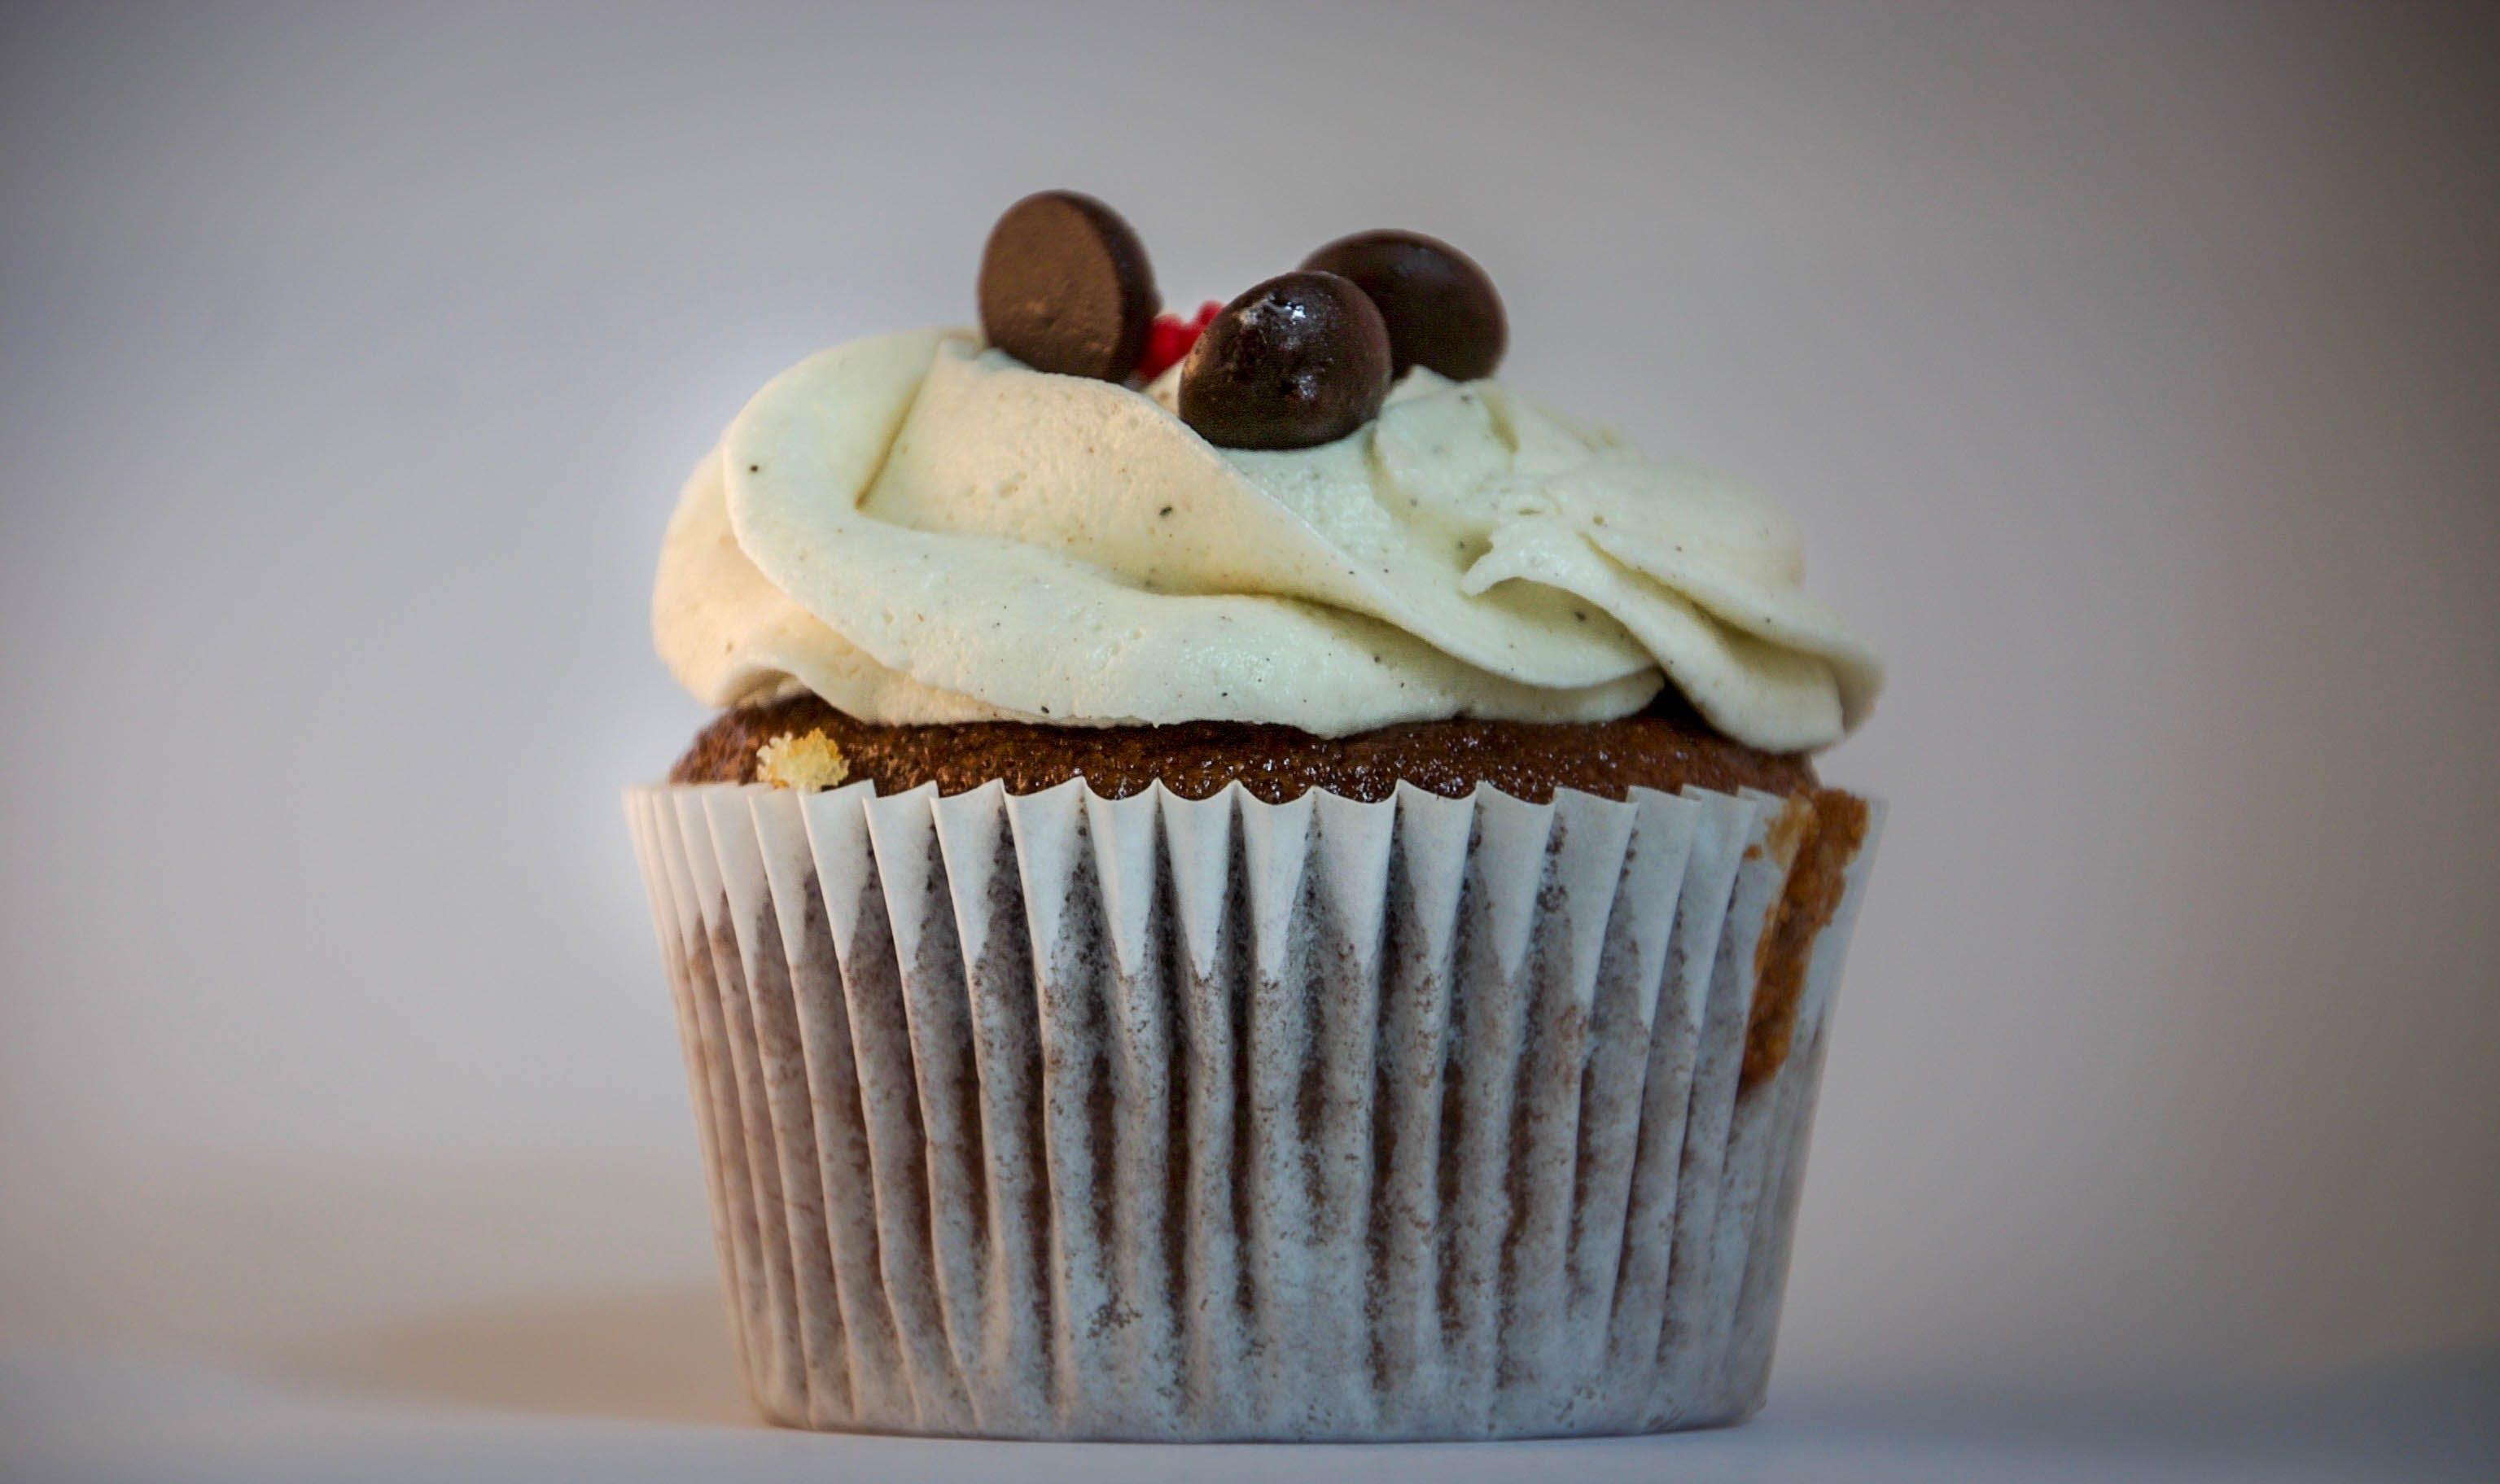 Free stock photo of chocolate, chocolate cupcakes, cupcake, whipped cream